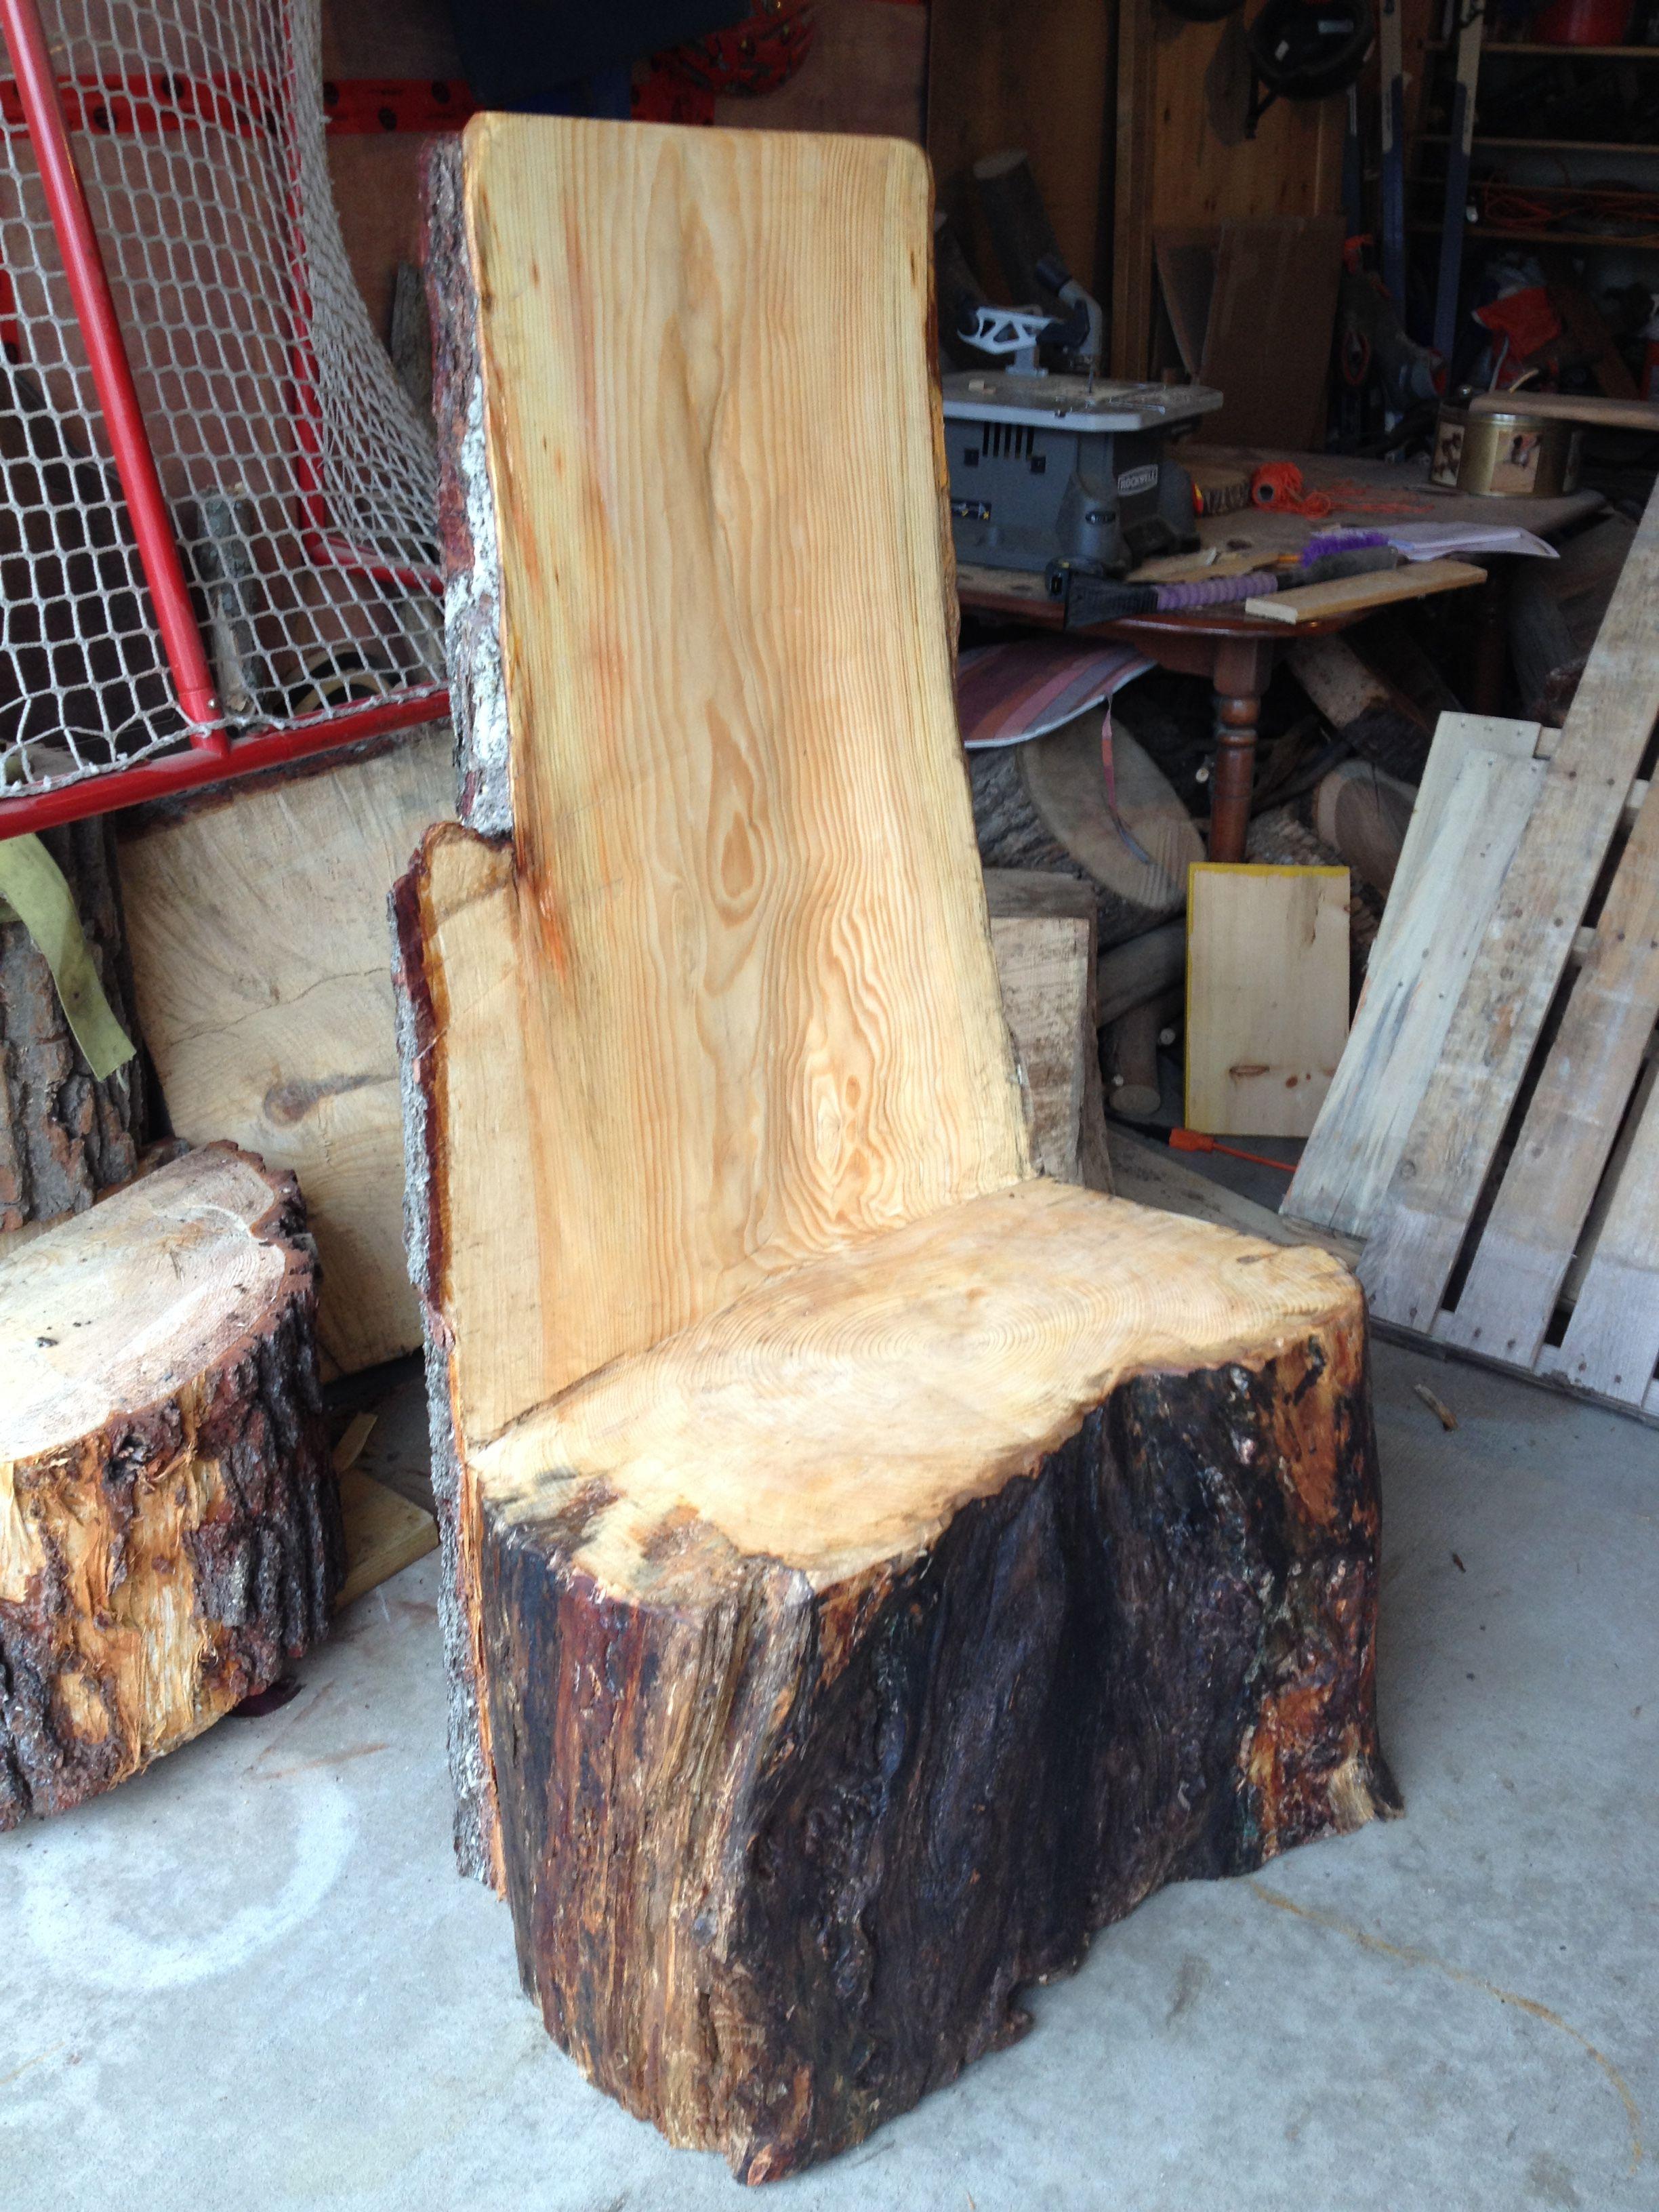 Charmant Log Chair, Stump Chair, Large Log Chair, Log Furniture,Rustic Décor, Resort  Furniture, Reclaimed Furniture, Salvaged Furniture, Tree Stump Furniture